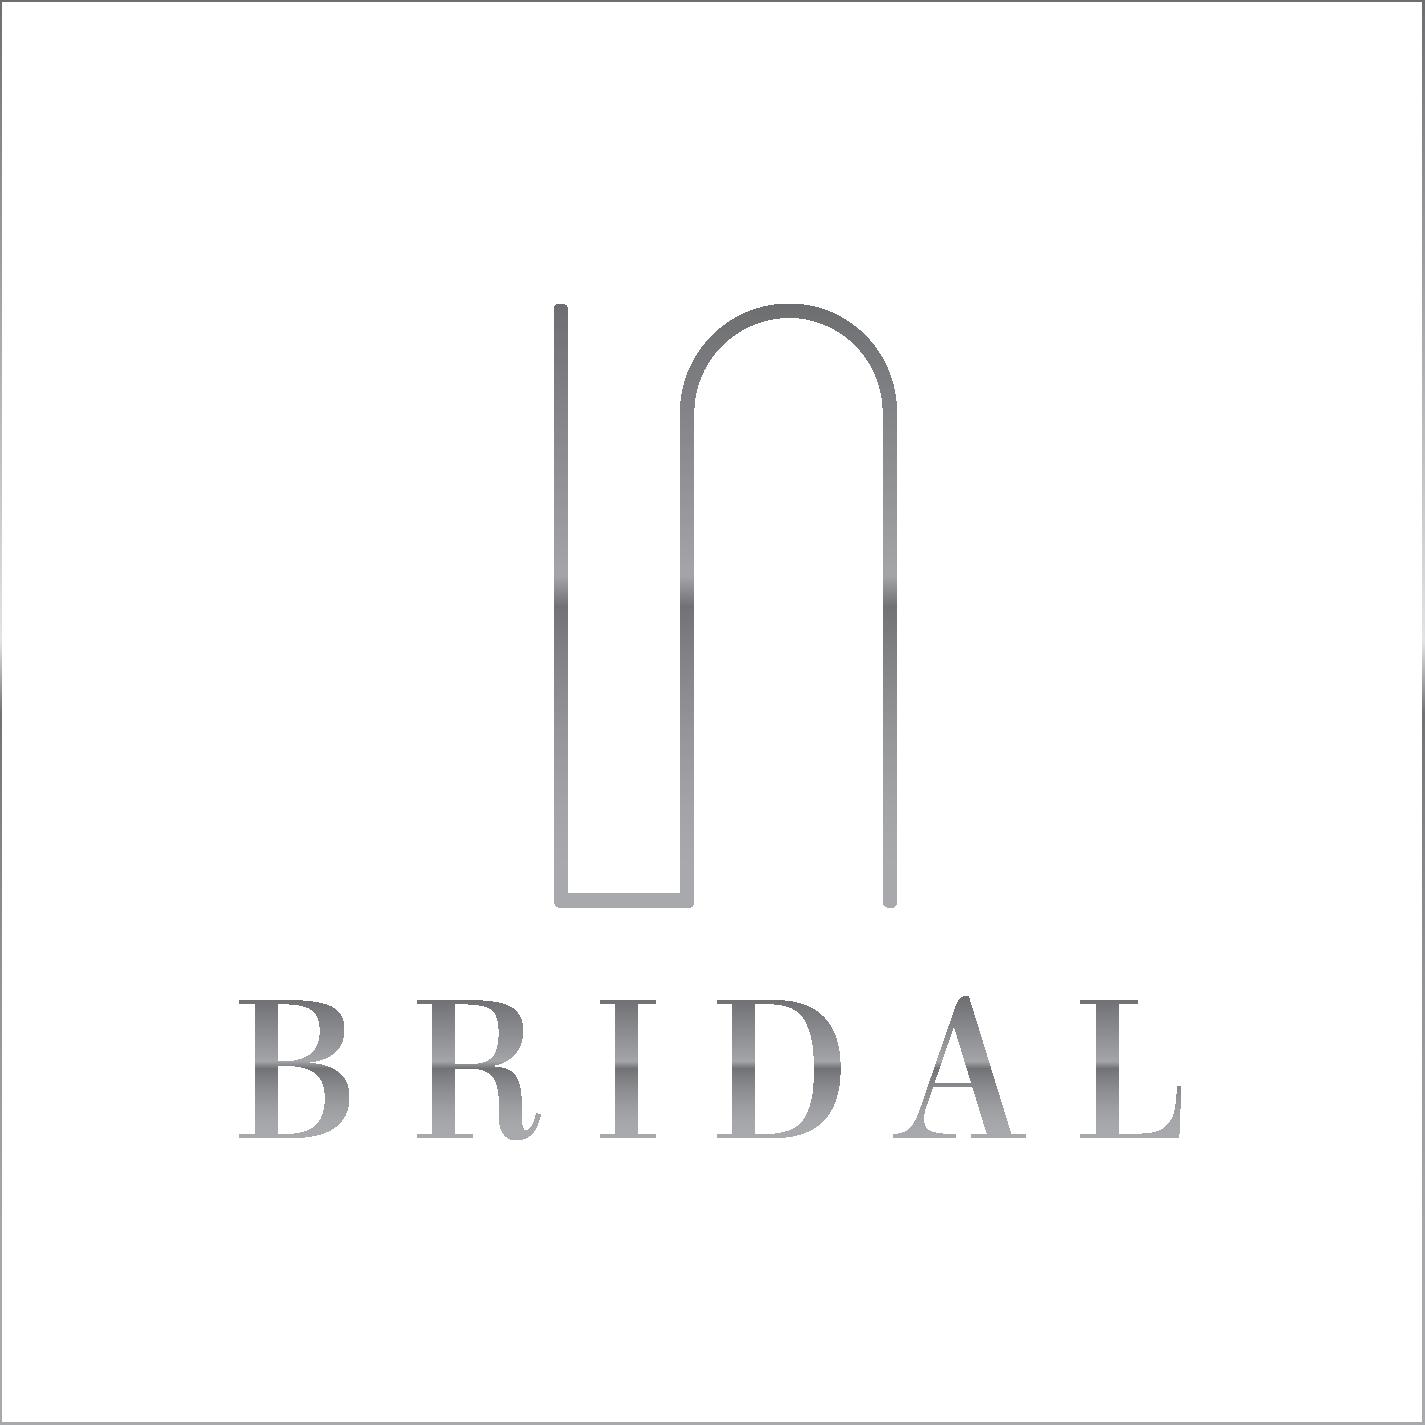 Wedding Dresses, Bridal Shop, Tuxedos: Boise, Idaho Falls, ID ...